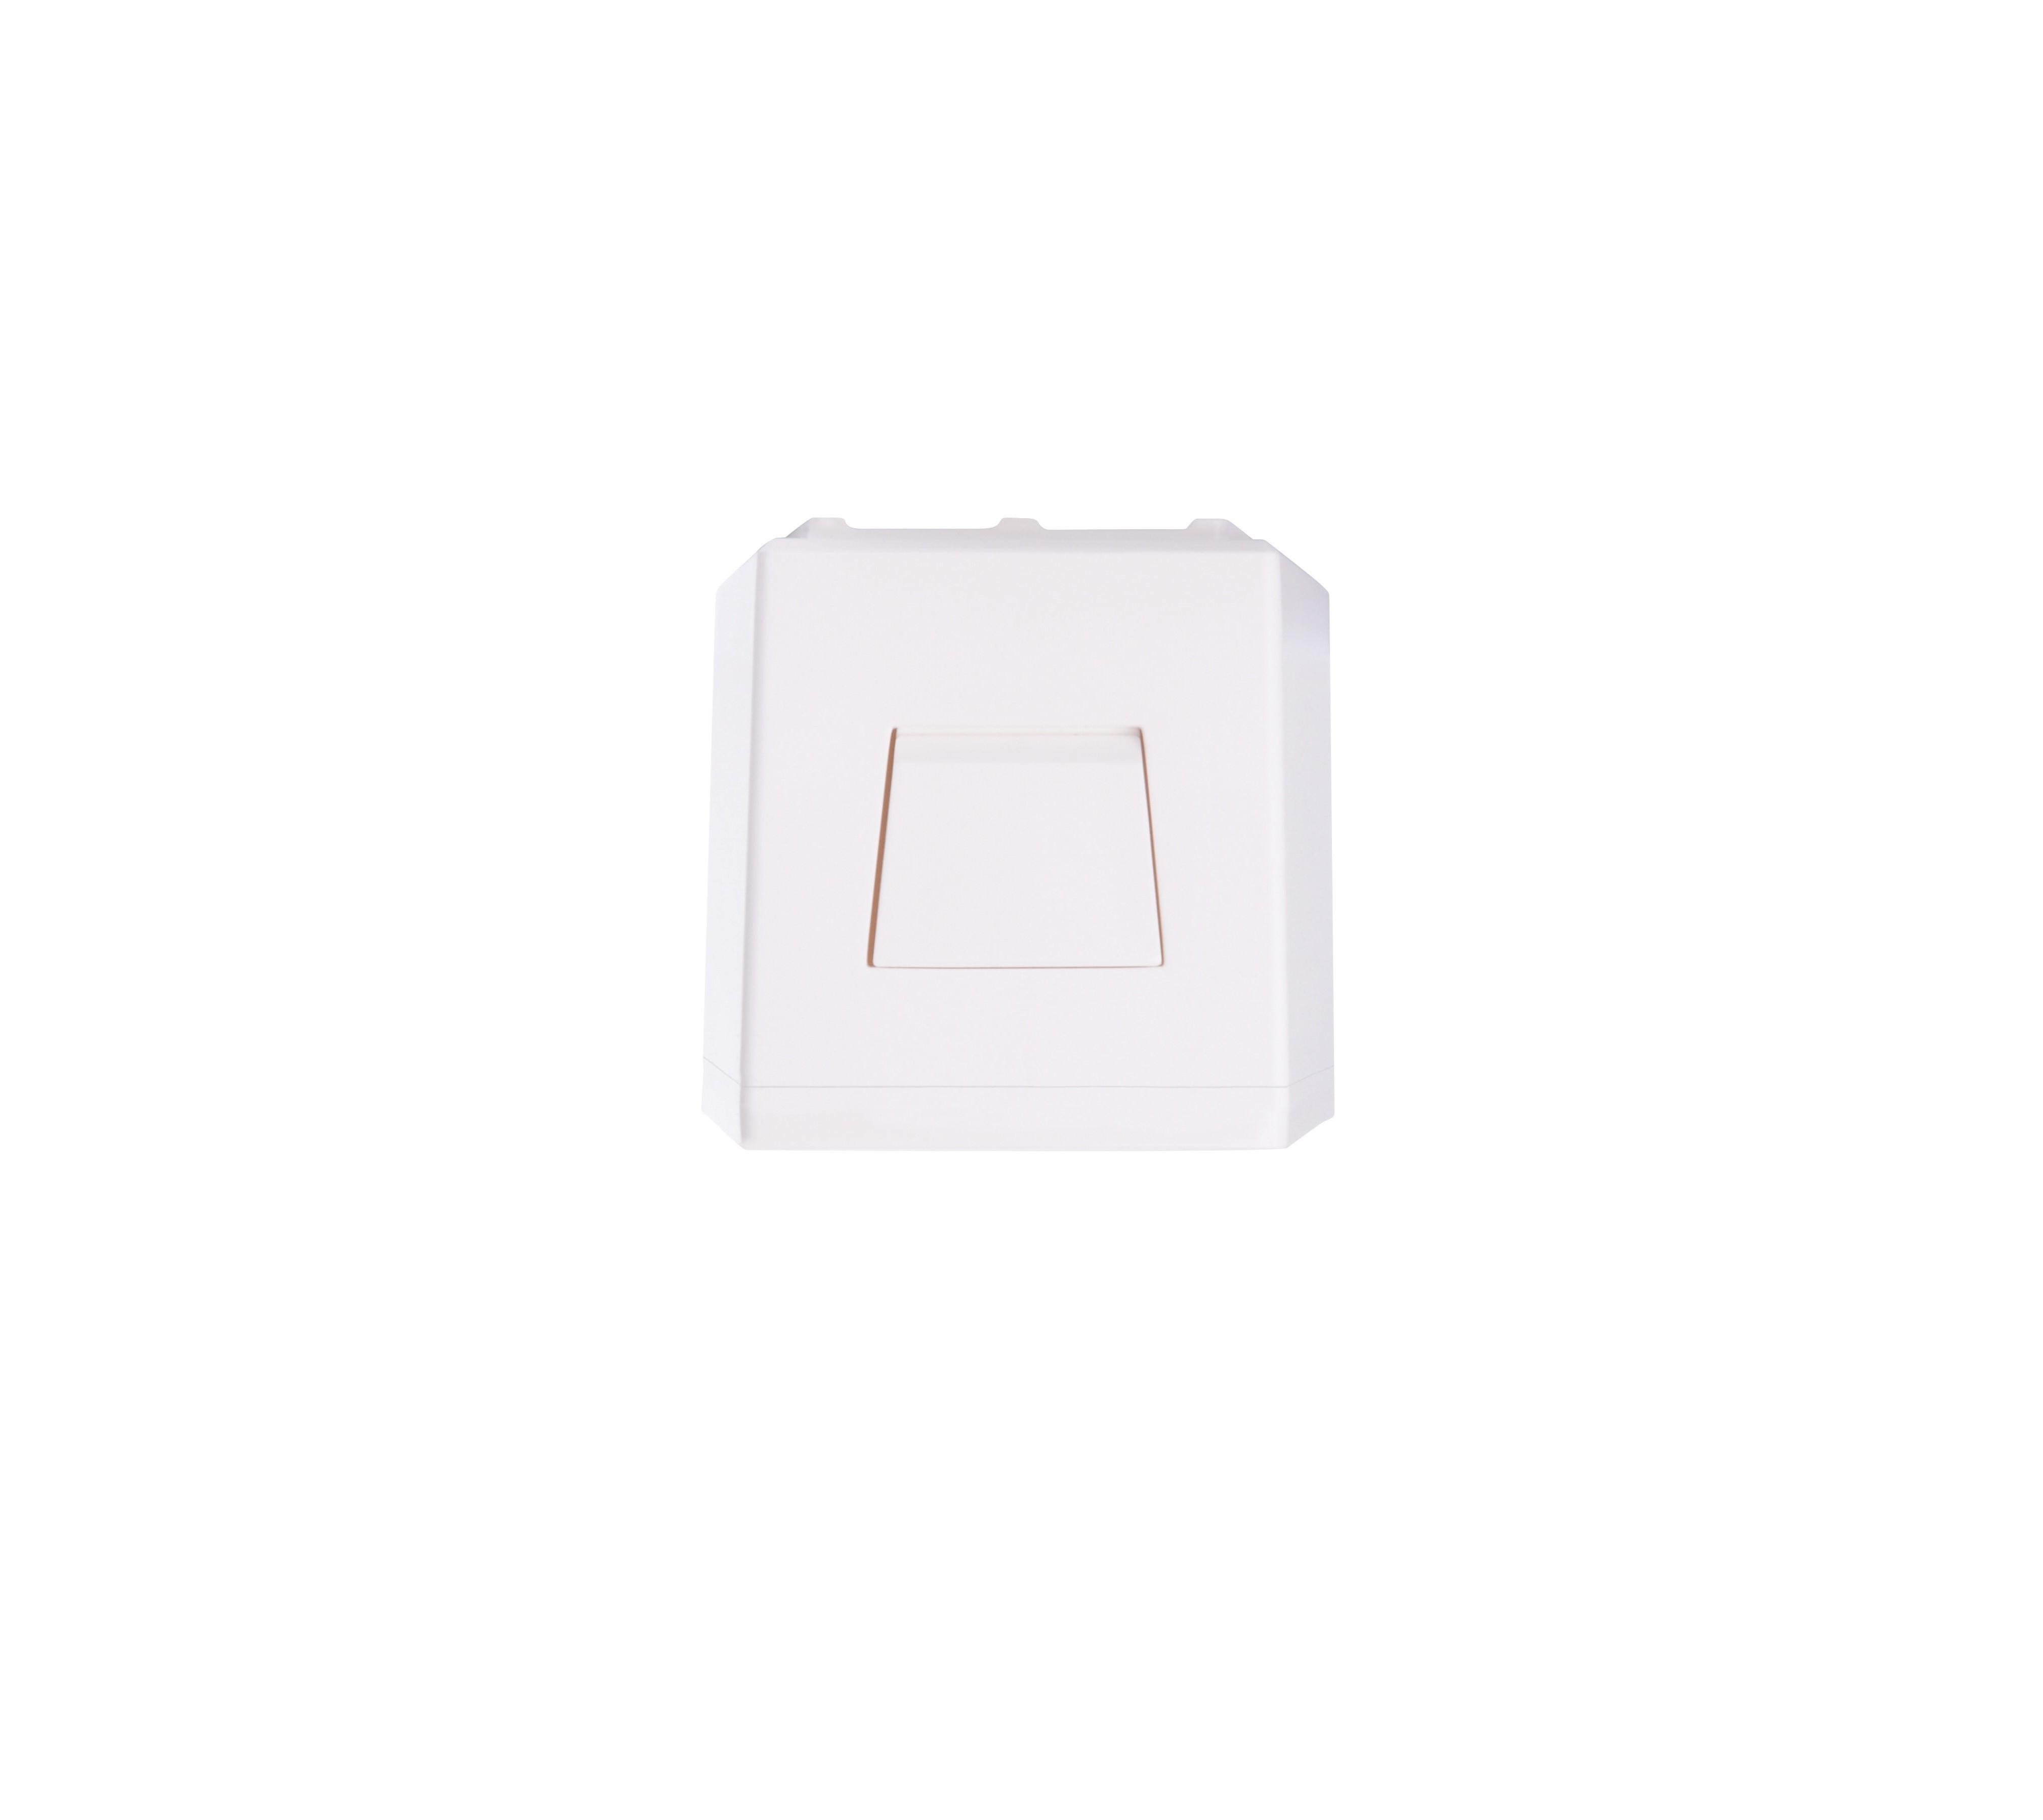 Lampa antipanica led Intelight 94752   3h mentinut test automat 1